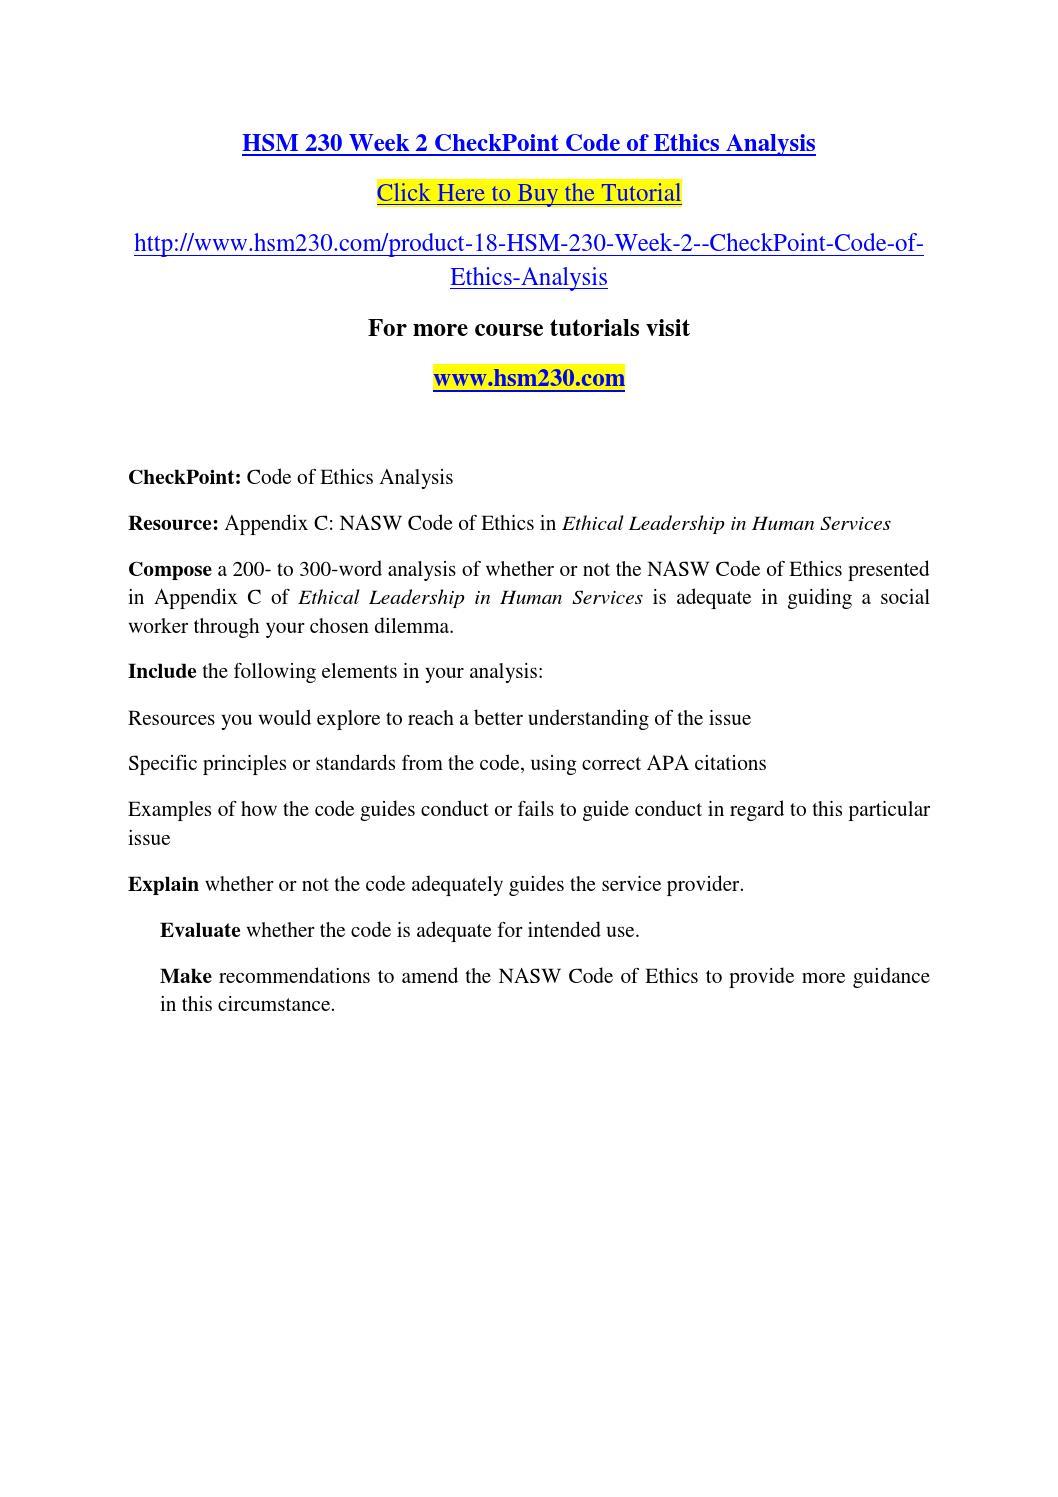 Hsm 230 week 2 checkpoint code of ethics analysis by mahi37 - issuu